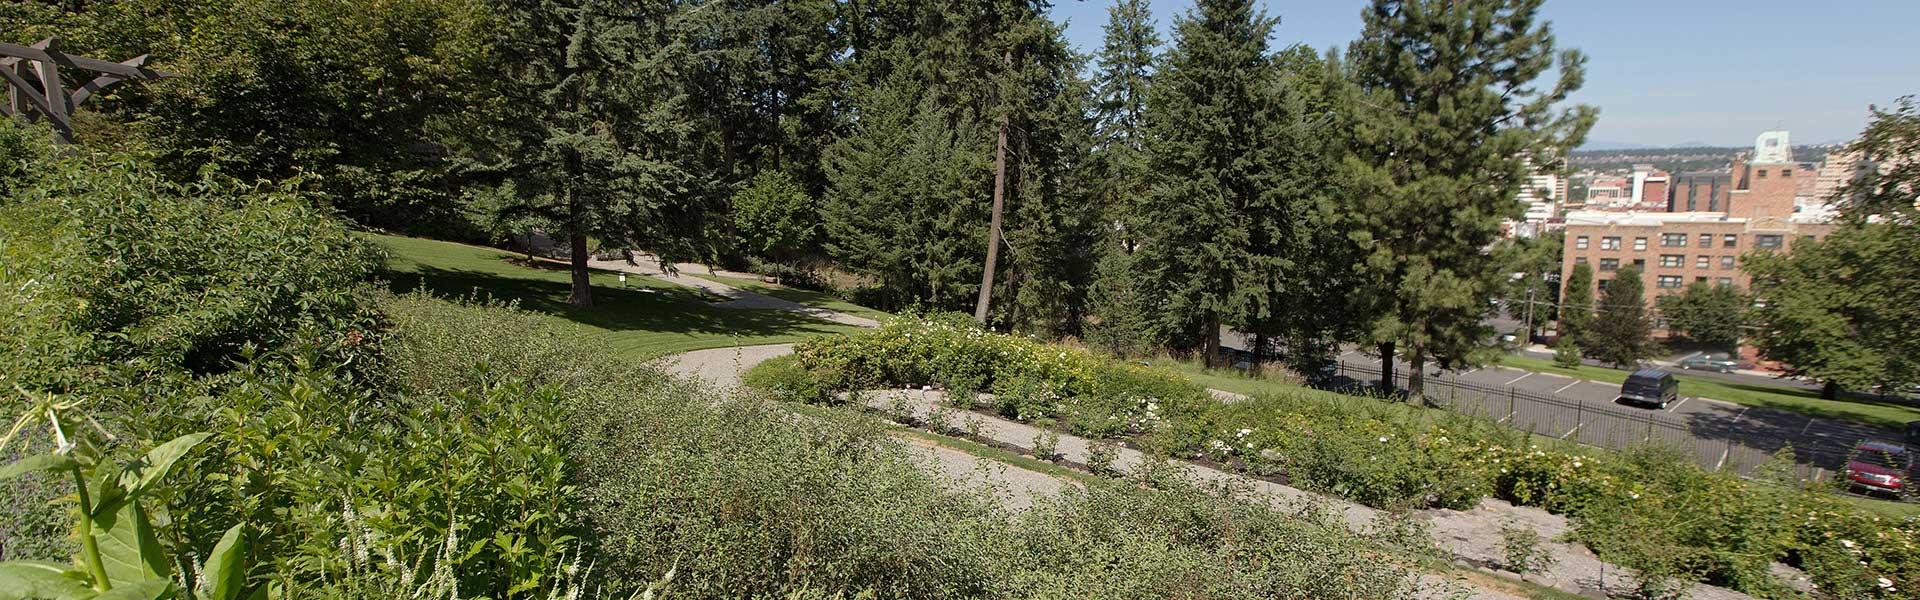 Moore-Turner Heritage Gardens - City of Spokane, Washington